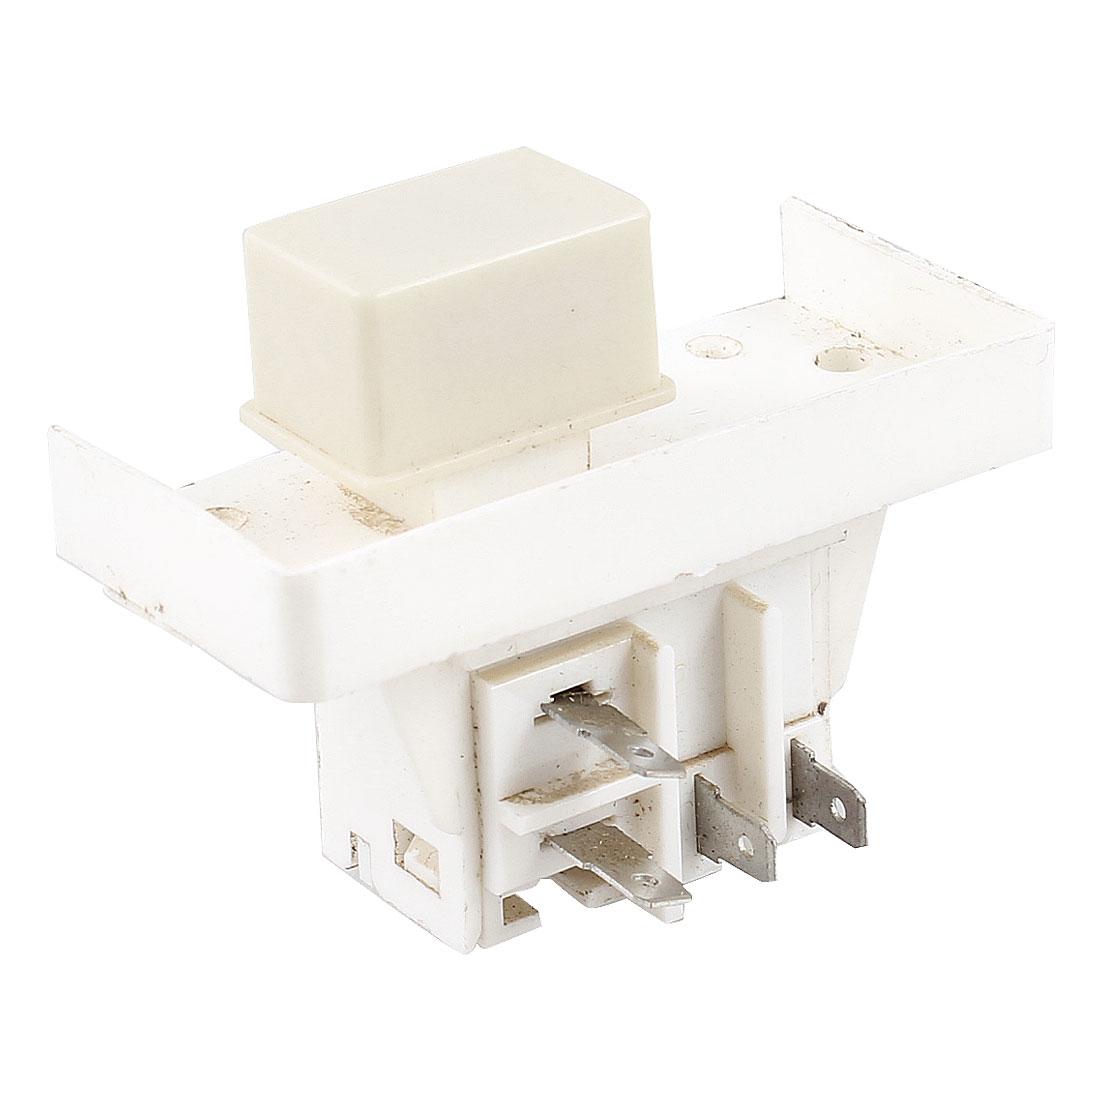 220V/240V NO Self Locking Rectangle Power Switch for Washing Machine